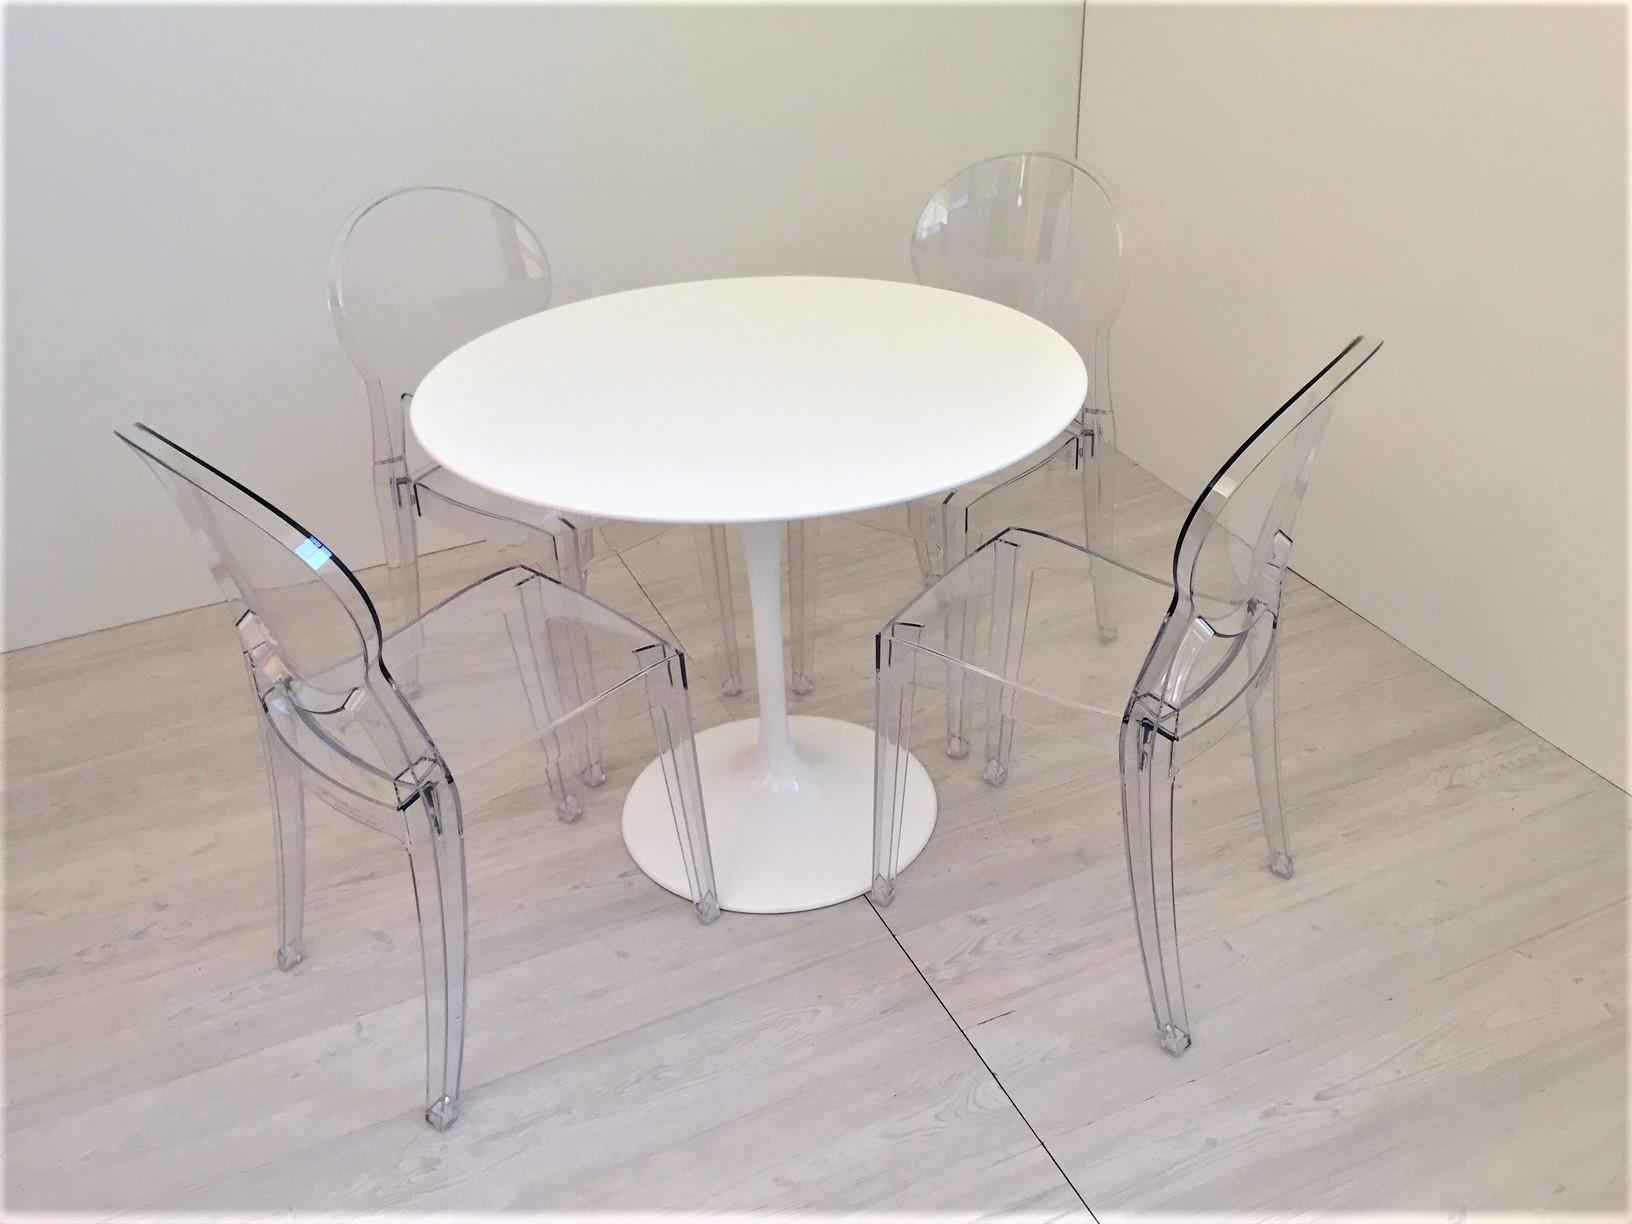 Tavolo E Sedie Trasparenti.Set Di 4 Sedie Igloo In Policarbonato Trasparente Instant Design